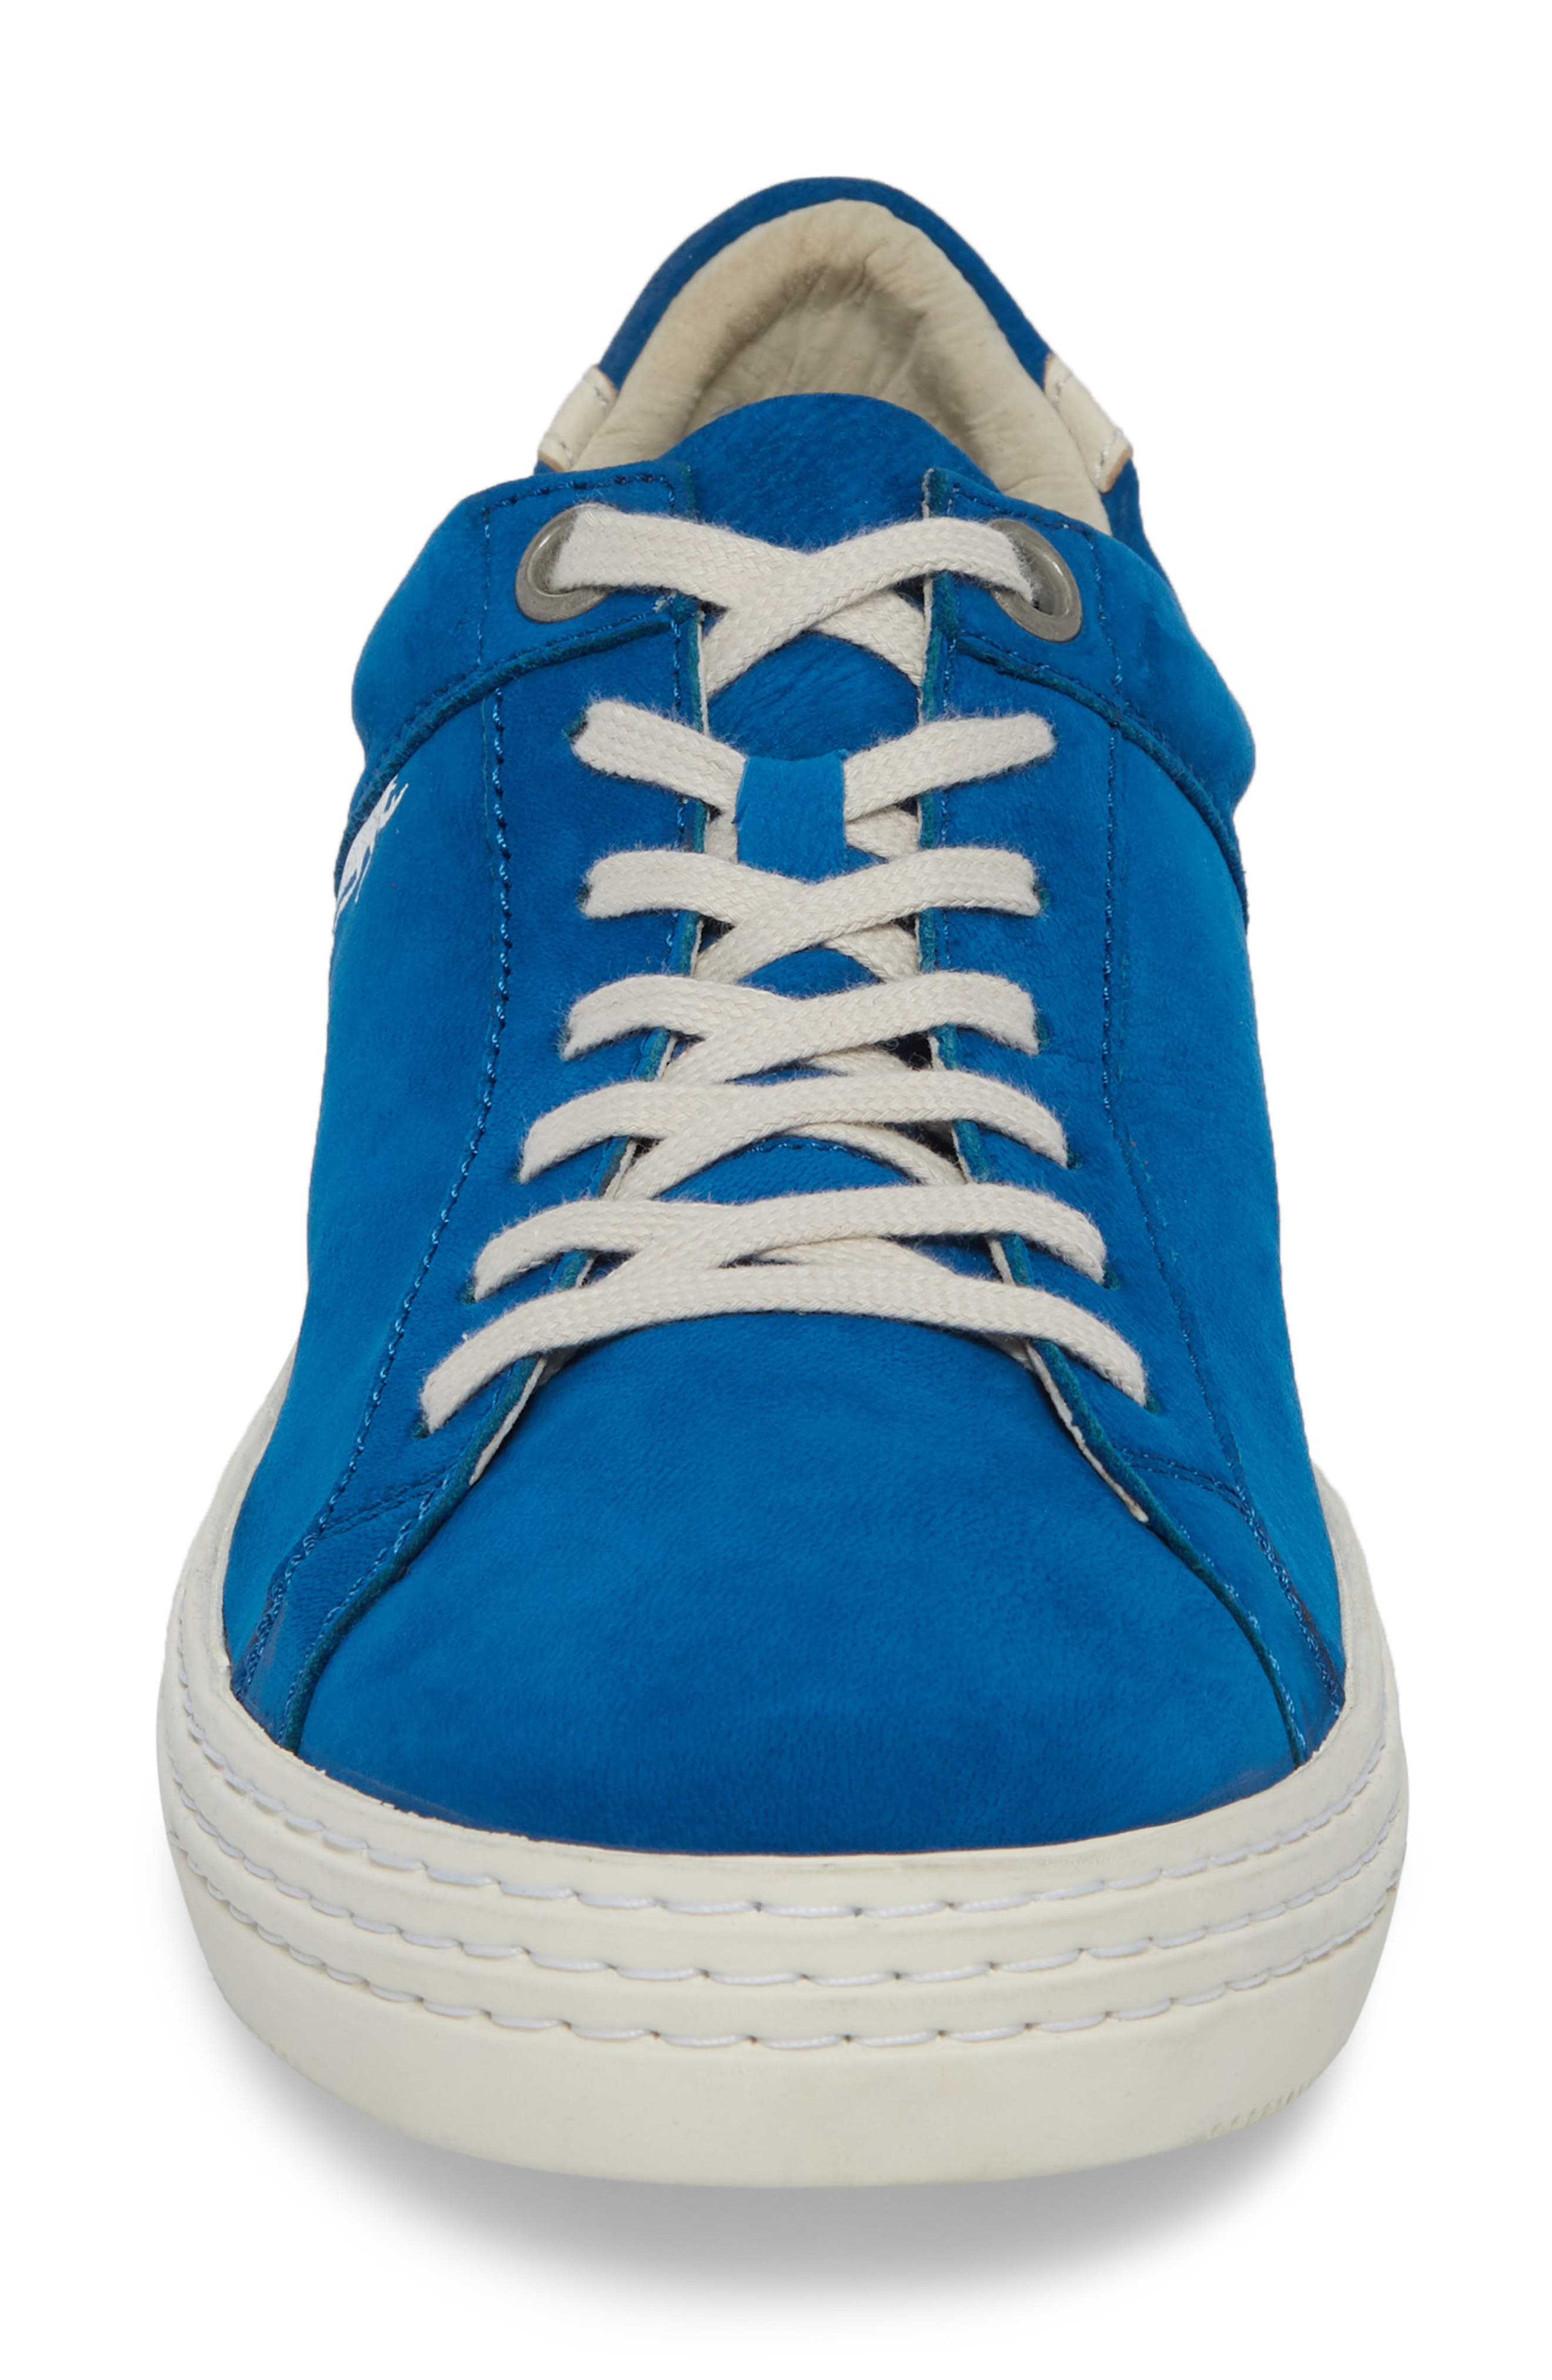 Sene Low Top Sneaker,                             Alternate thumbnail 4, color,                             ELECTRIC BLUE LEATHER